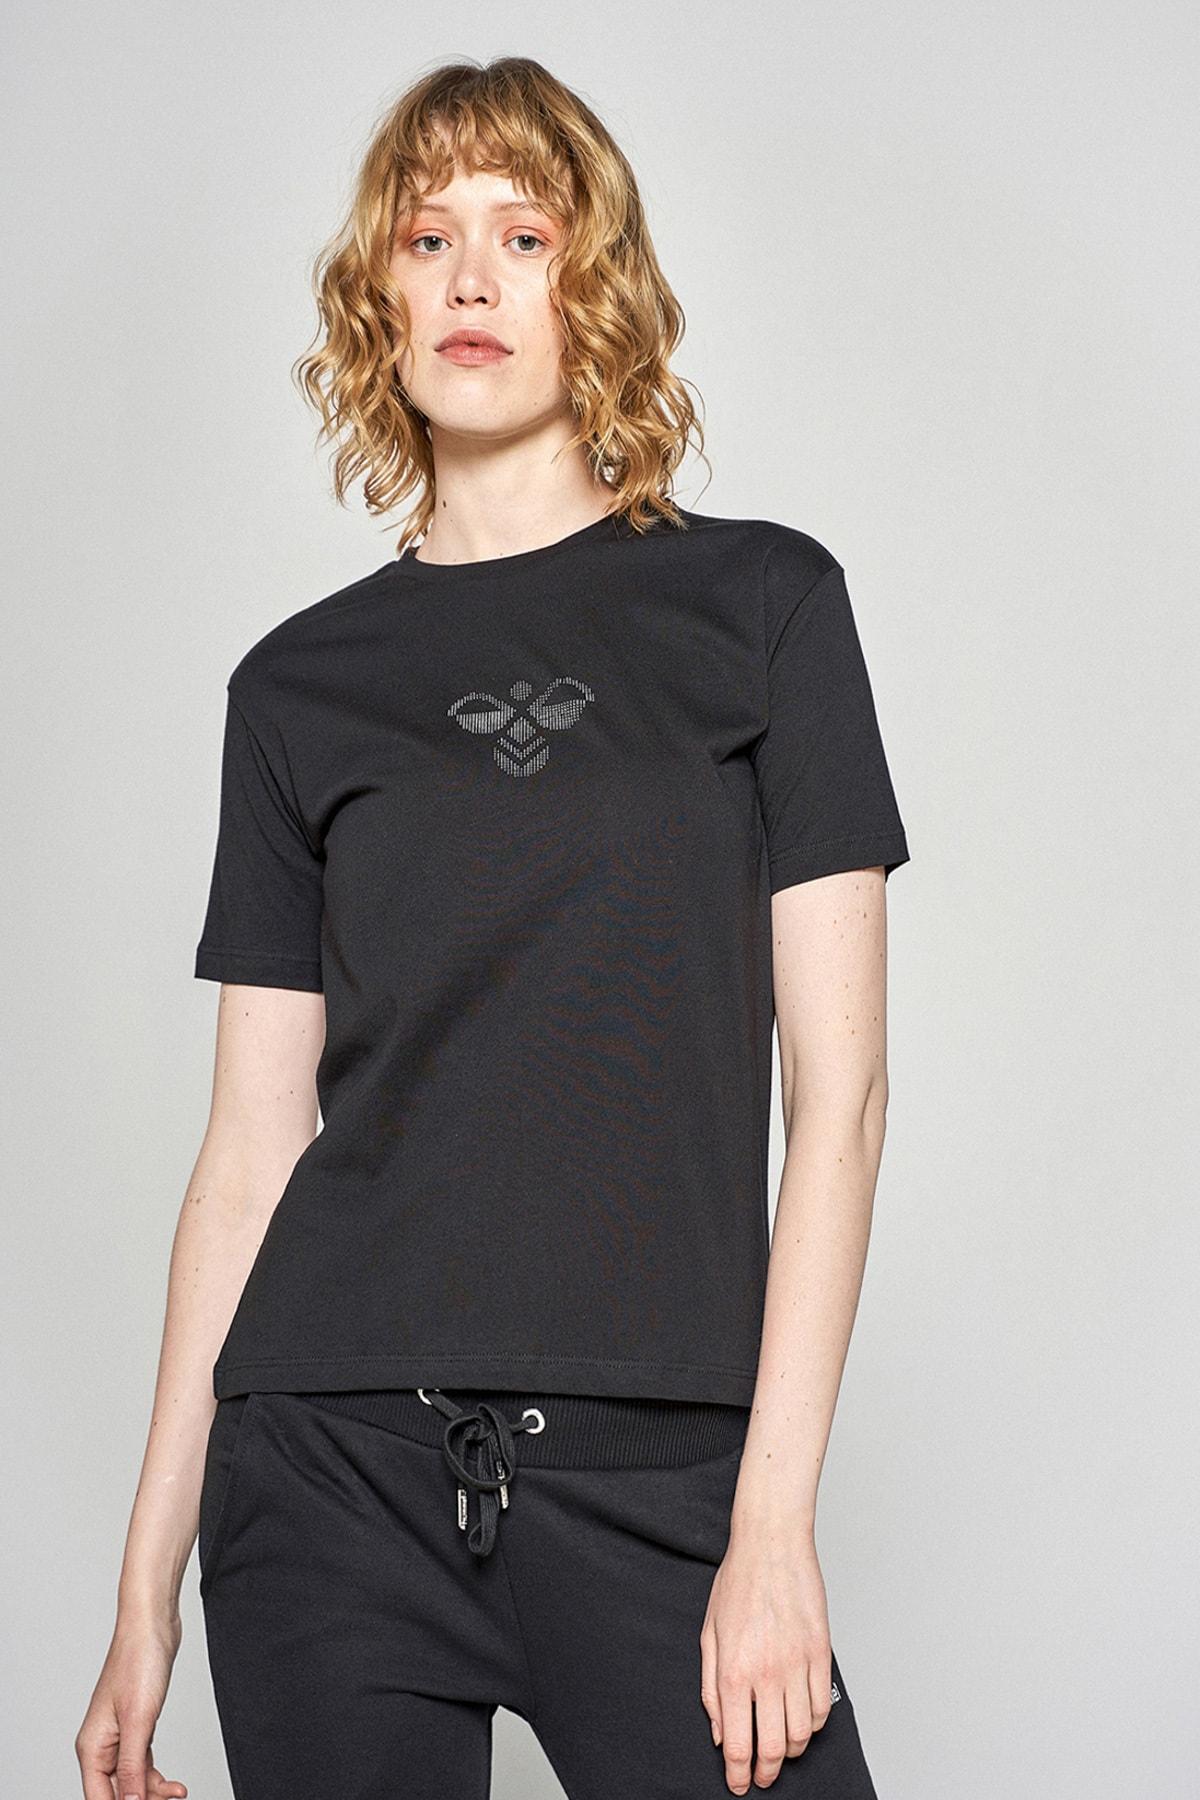 HUMMEL Kadın Siyah Jasmine T-shirt 911192-2001 1